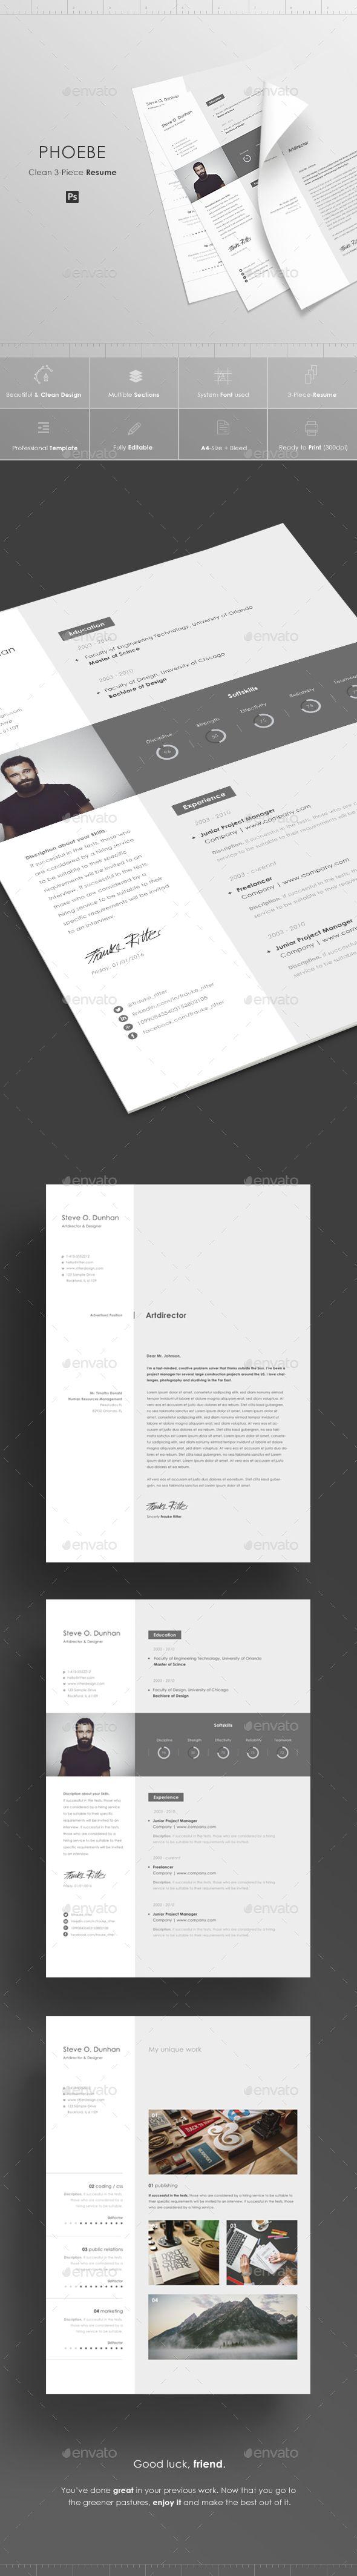 Software Programmer Resume samples VisualCV resume samples